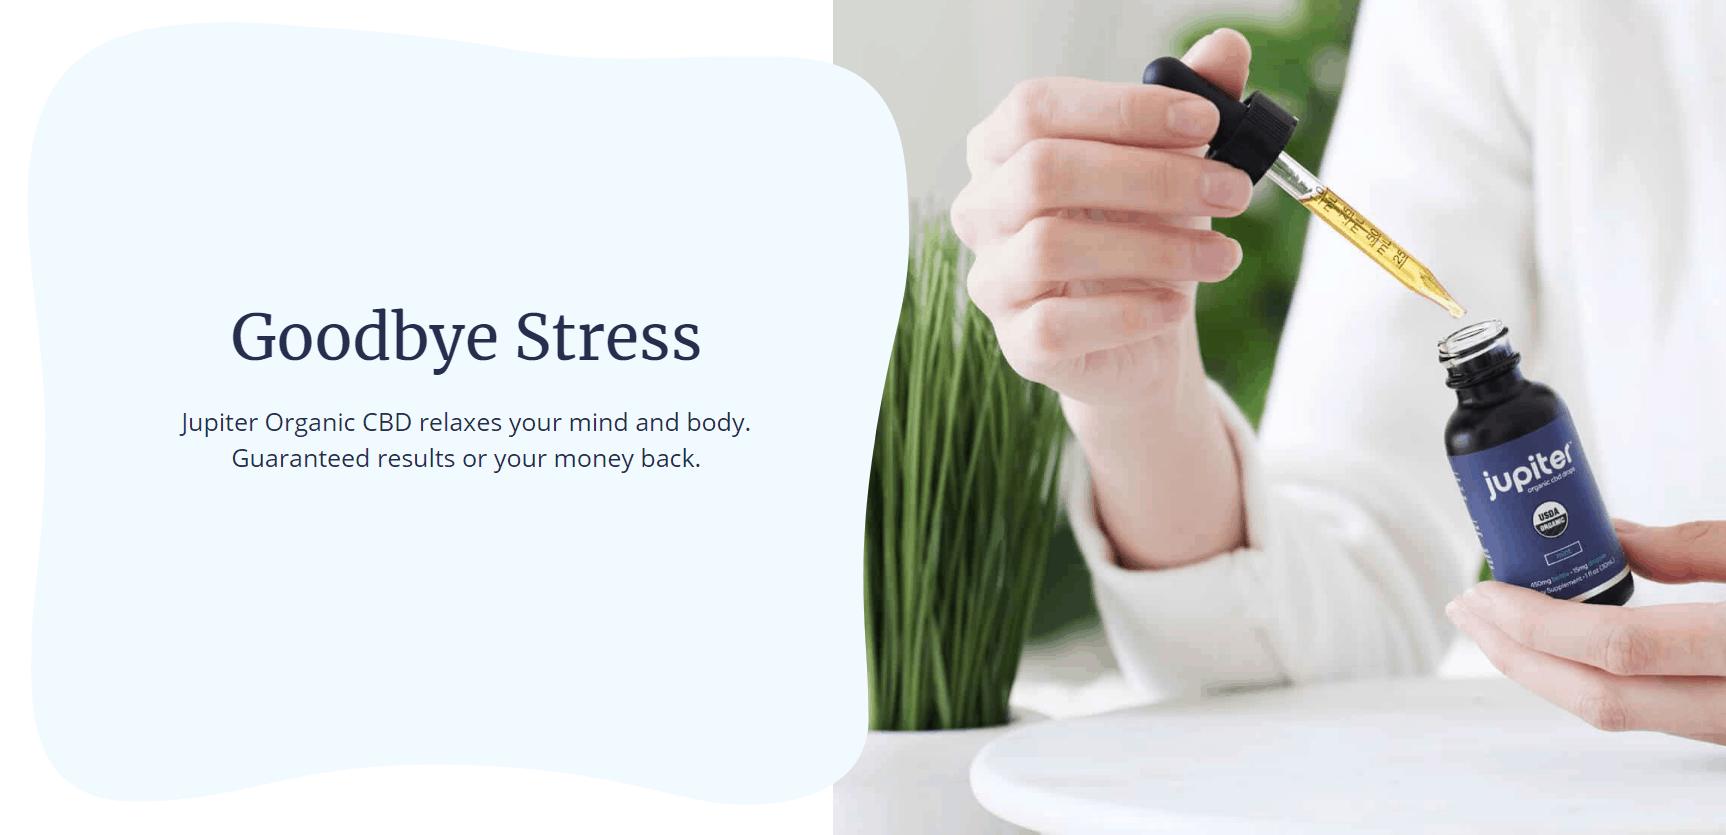 Jupiter Organic CBD for stress